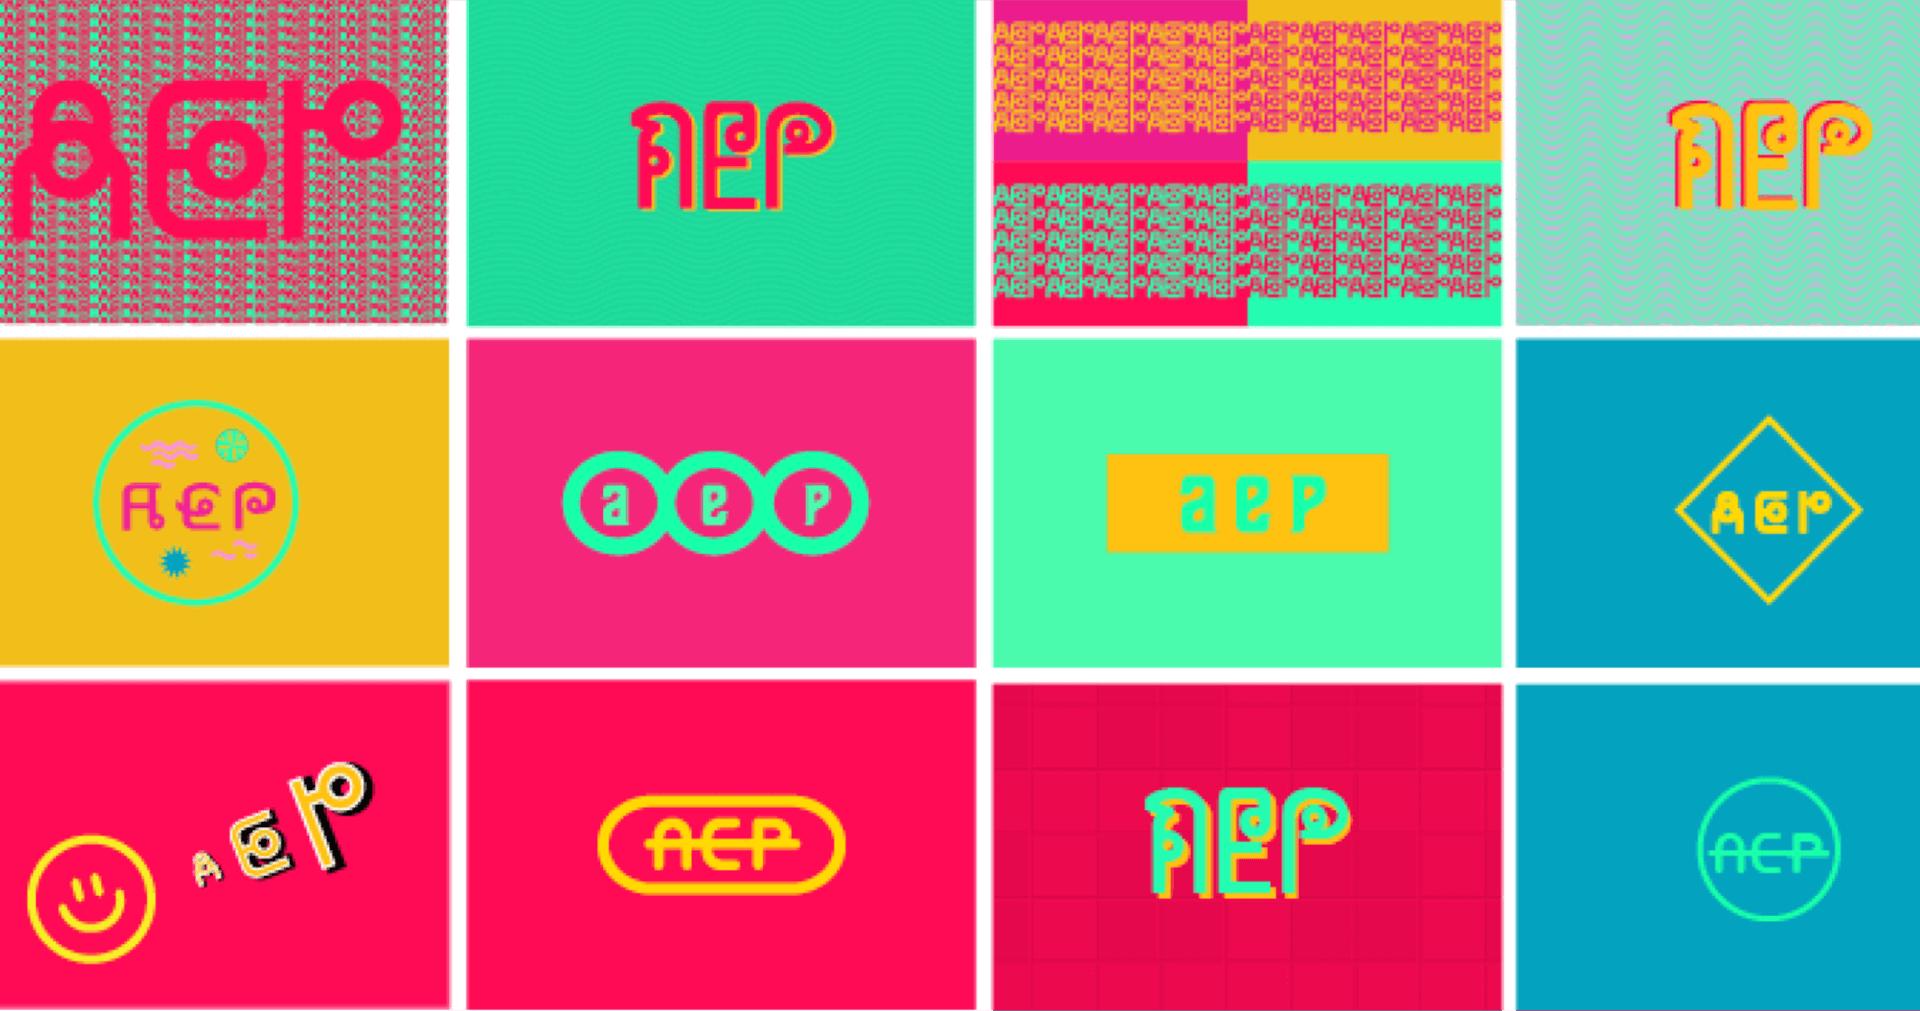 SSWeb-AEP-Iteration 2